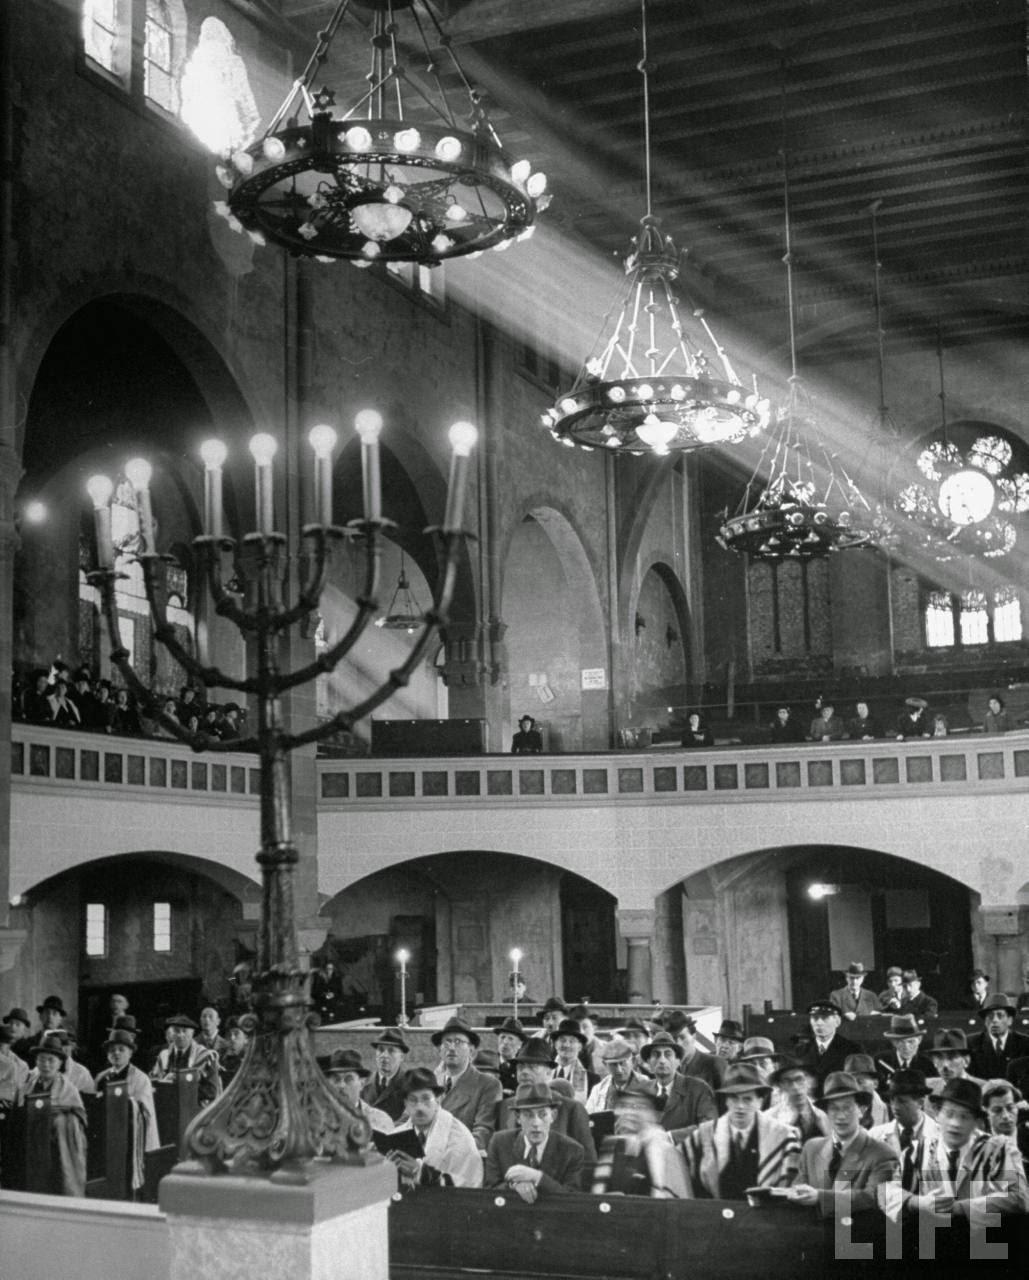 Passover in Berlin, 1945 (8)